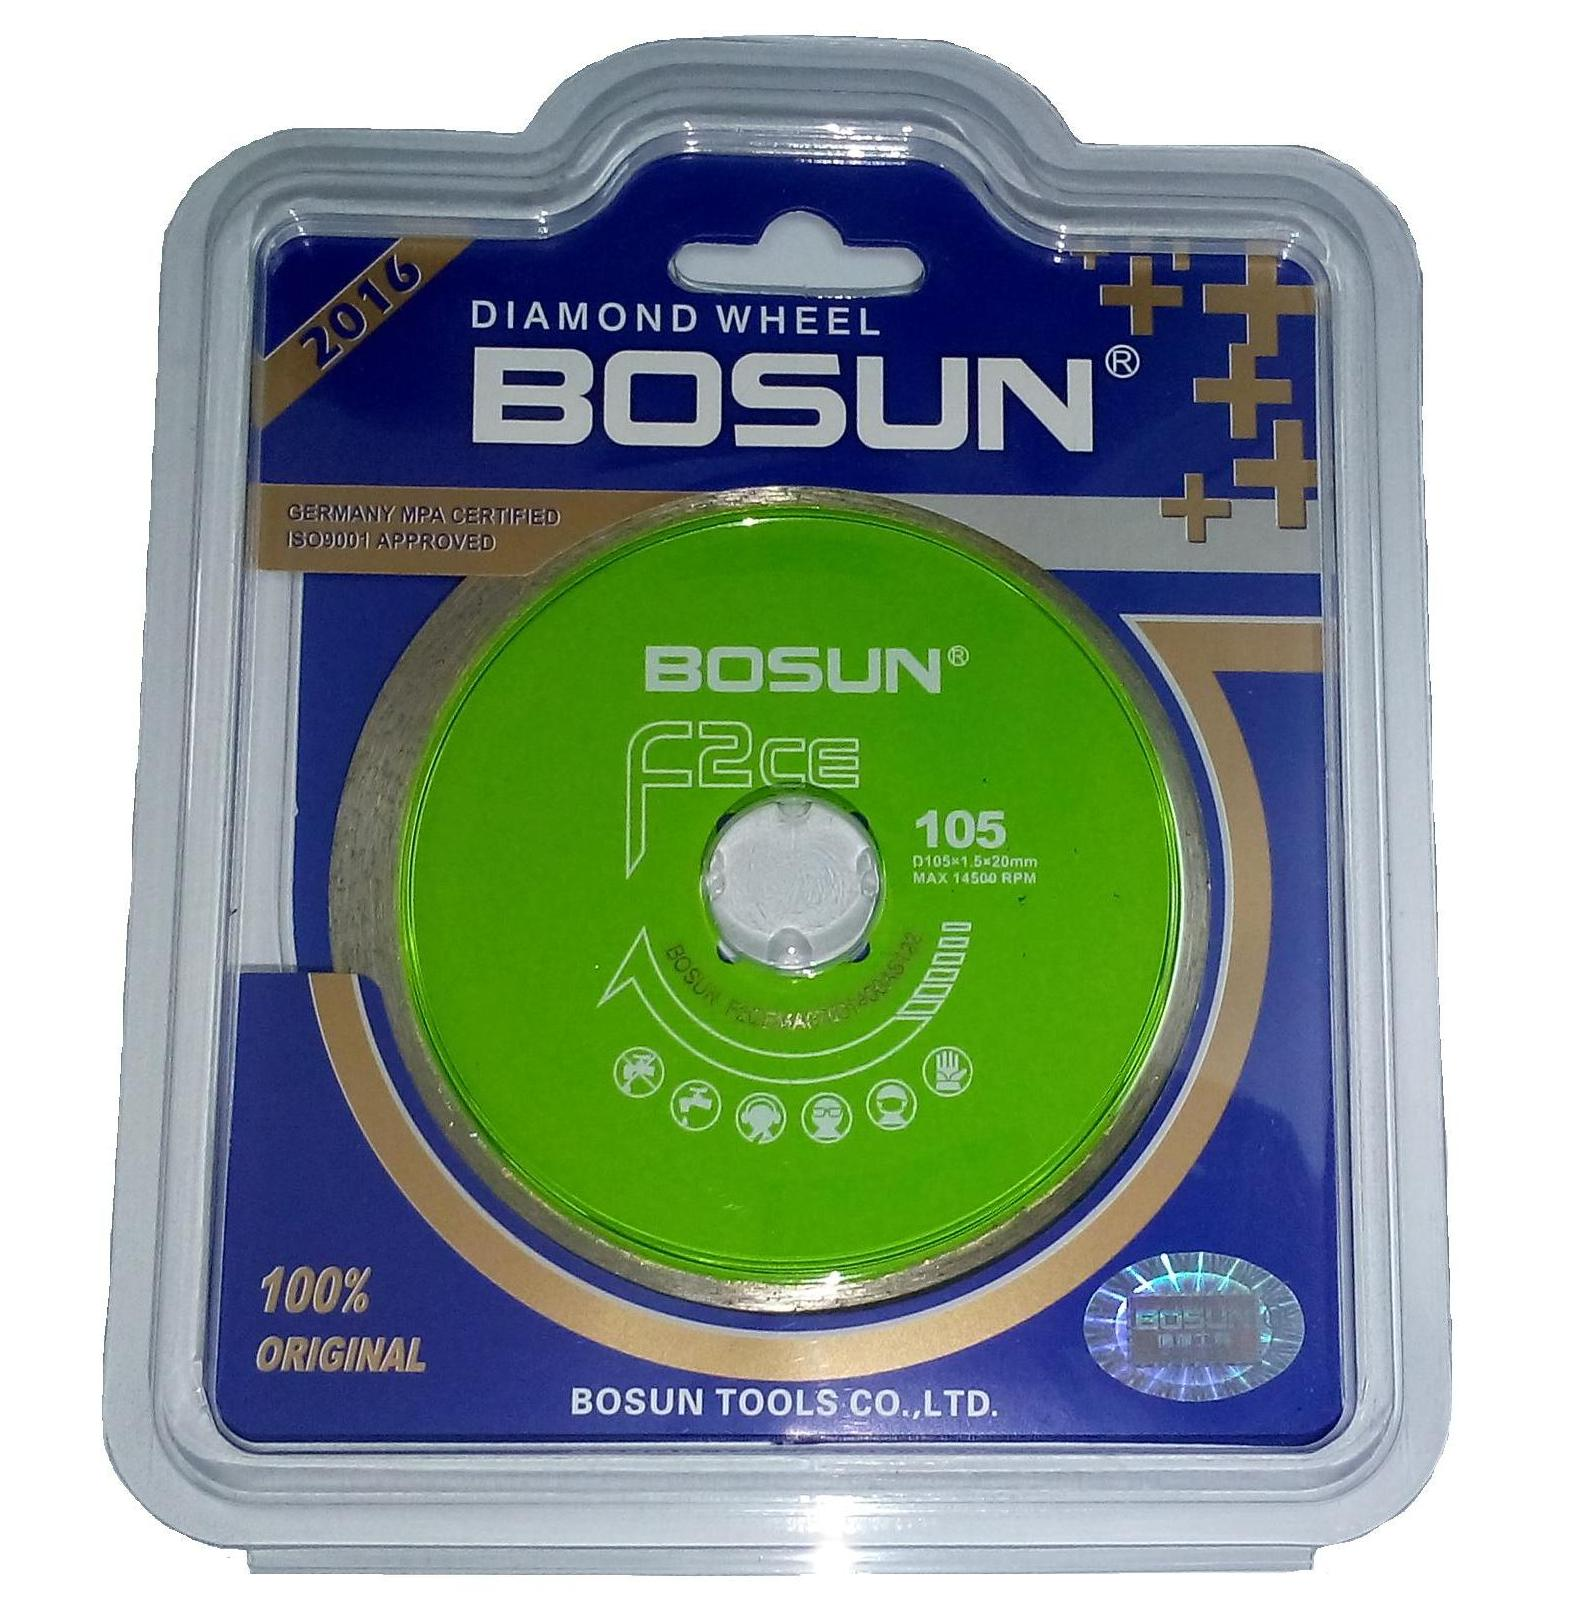 Lưỡi cắt F2CE Bosun (105x2.1x20mm)